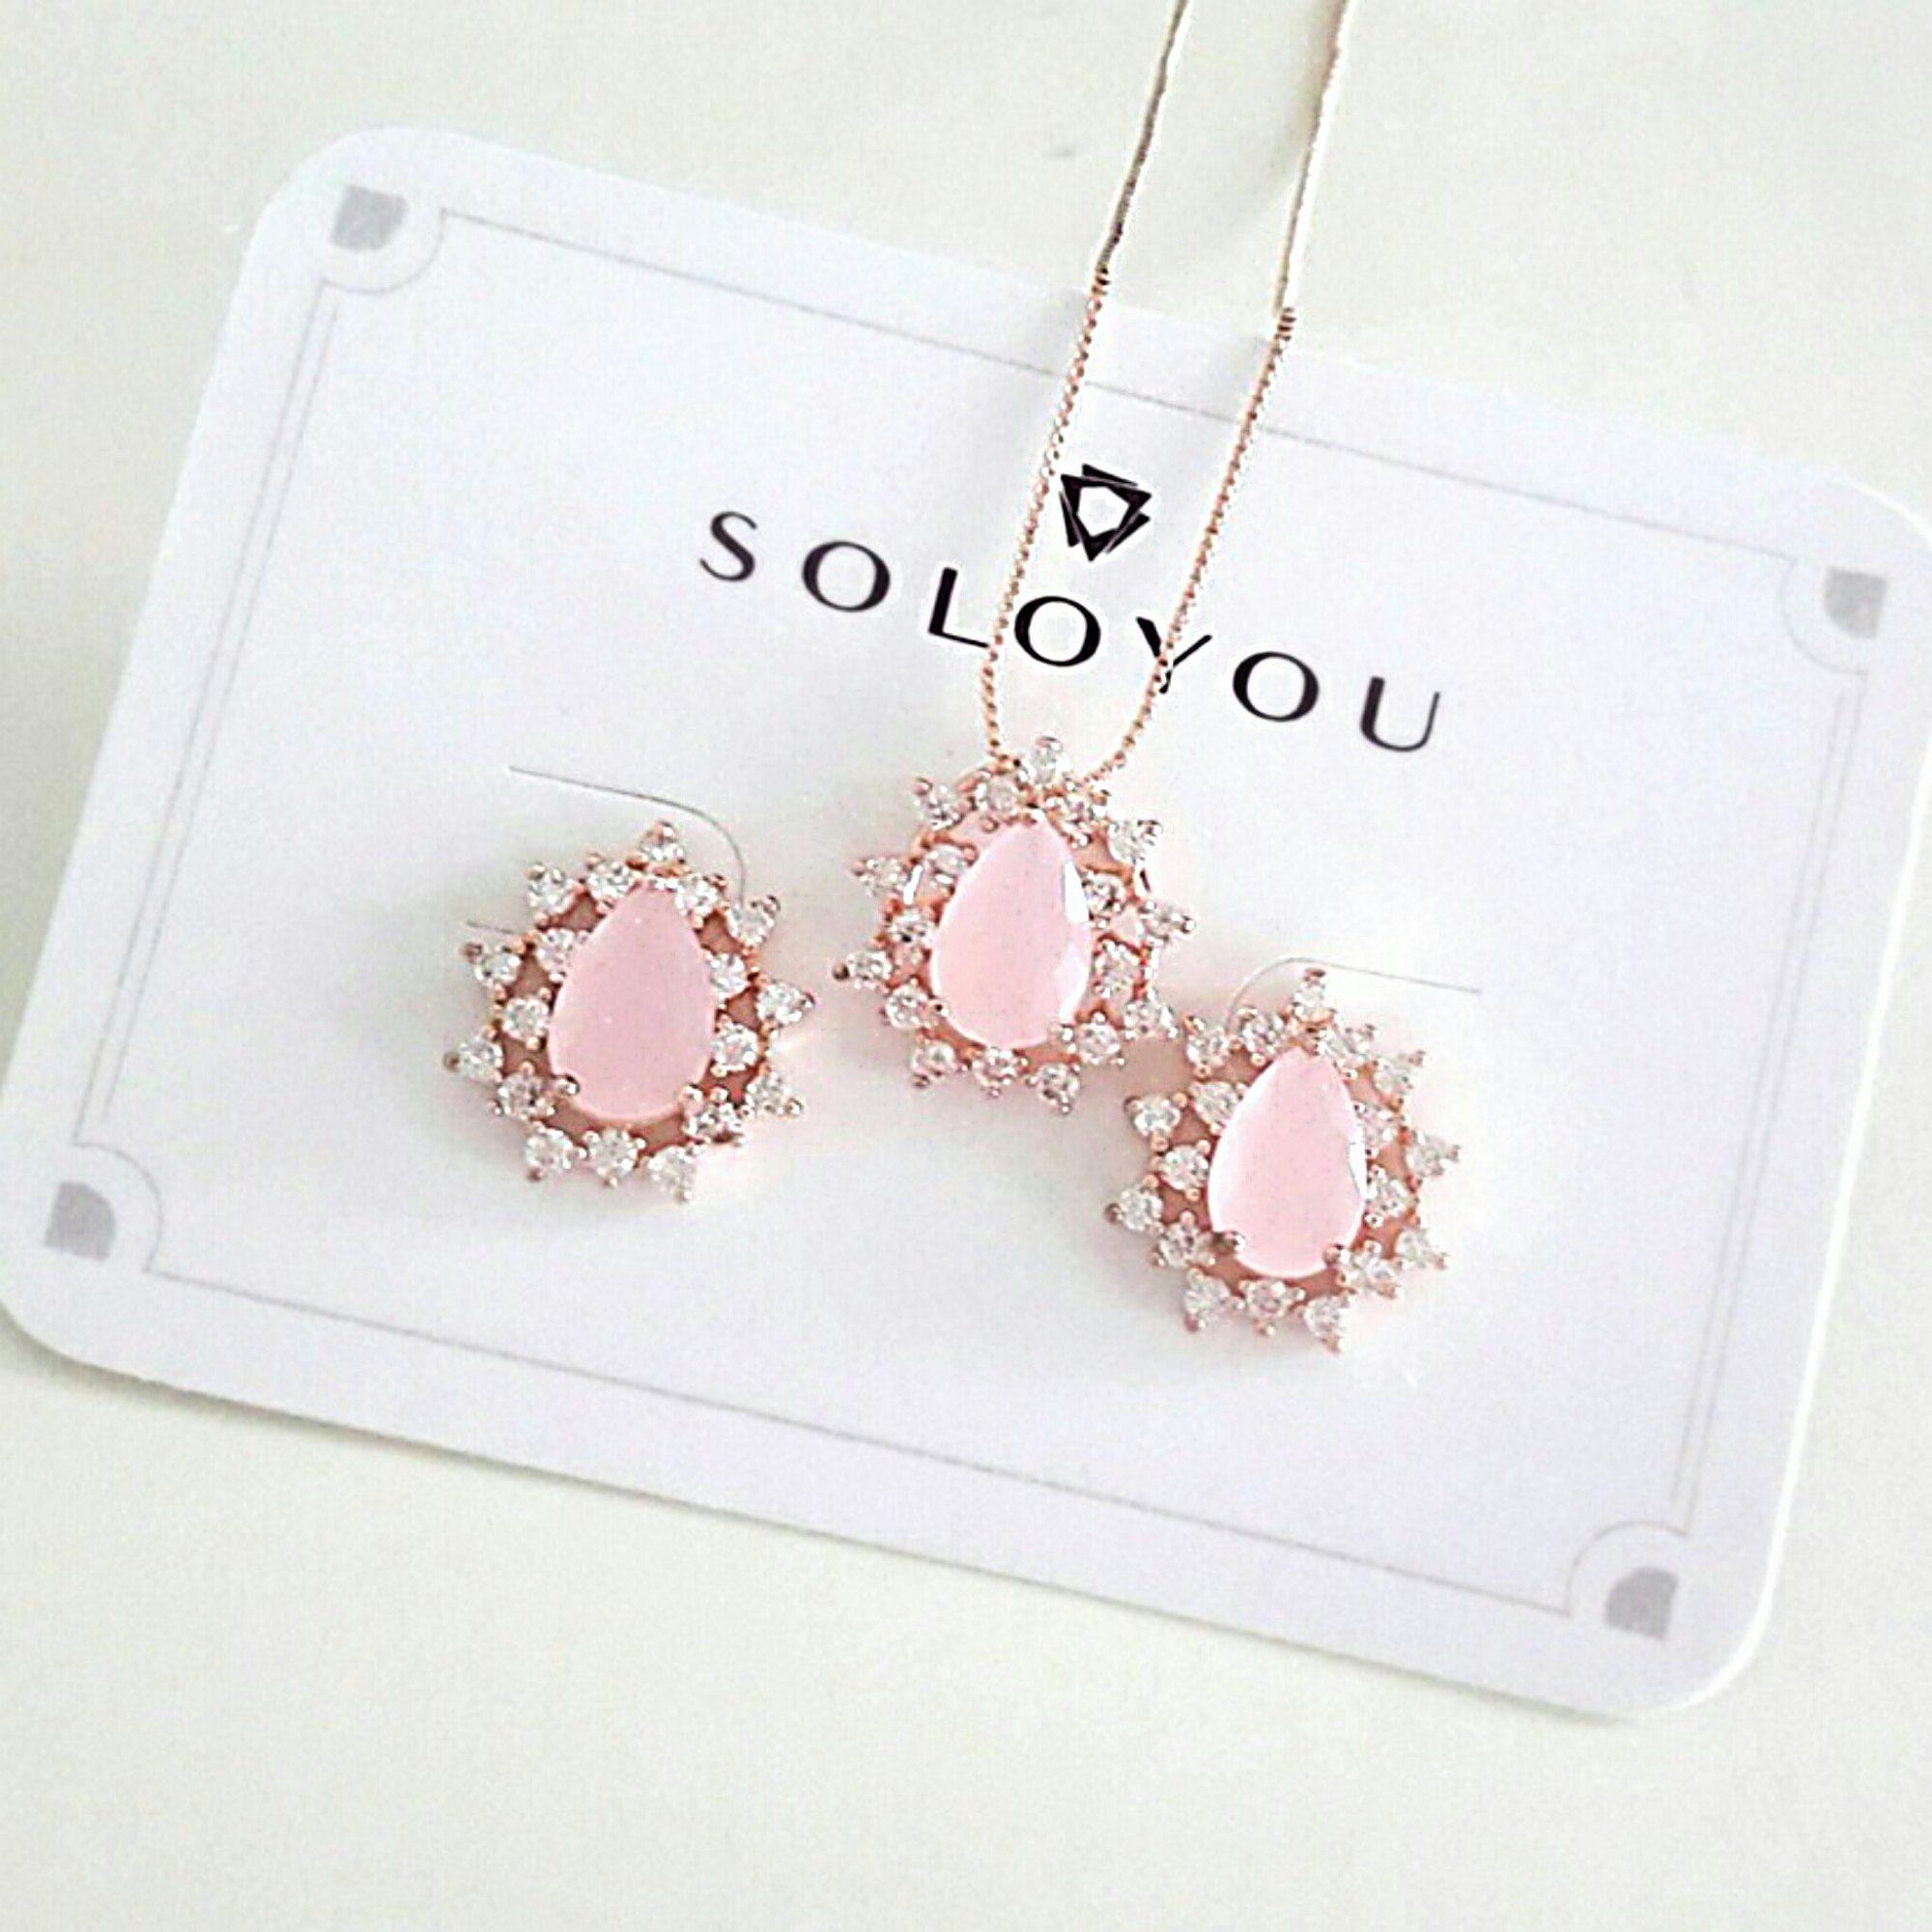 Colar Pingente Ouro Rosé Gota Rosa Semijoia Fina  - Soloyou